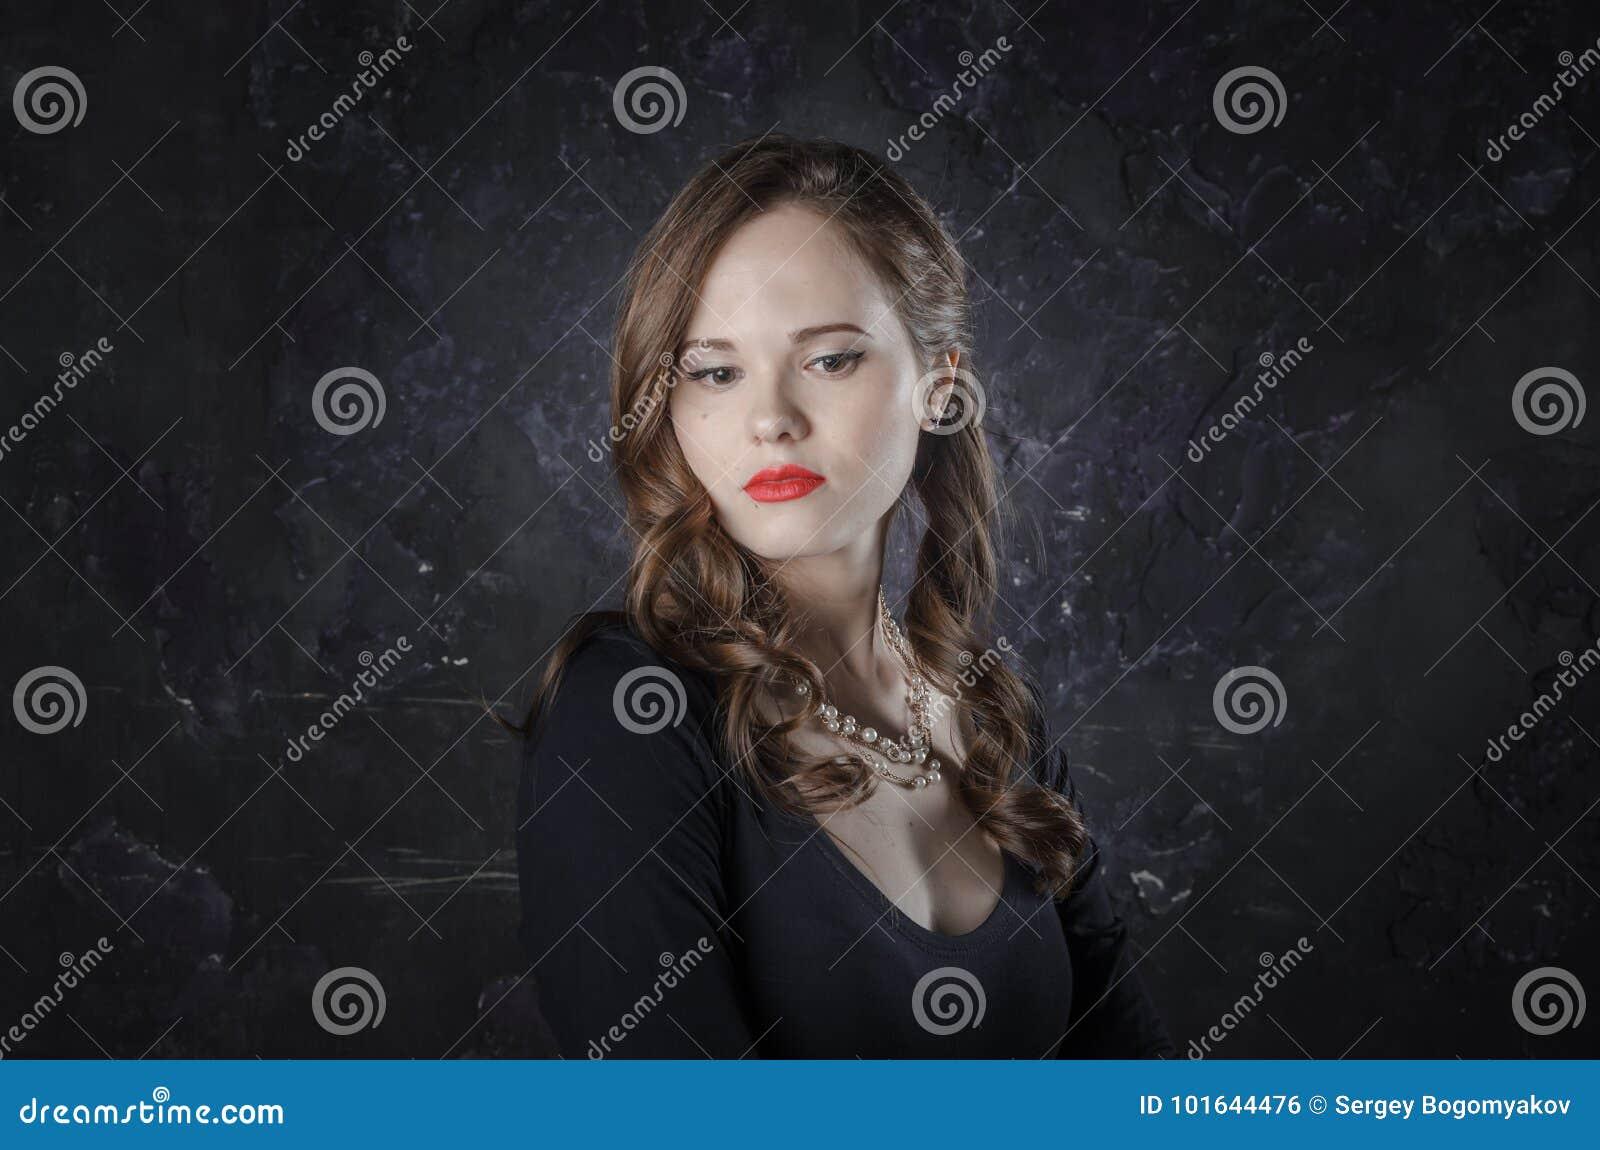 La dama vestida de negro pelicula